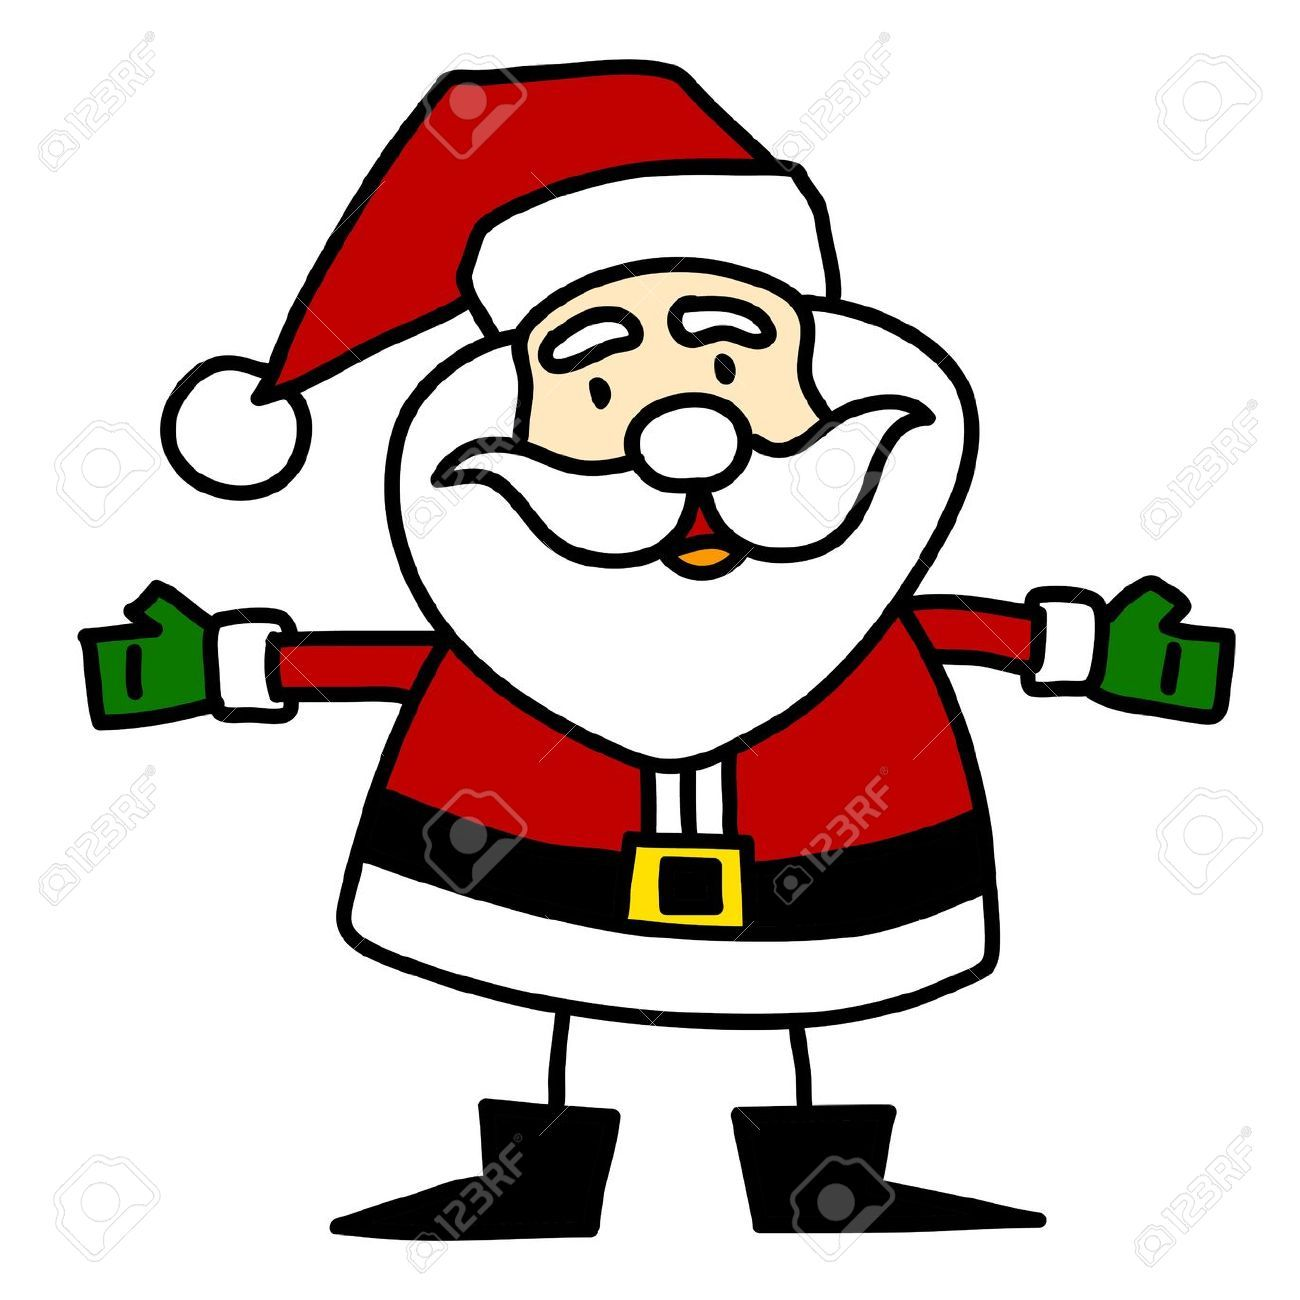 cartoon santa Google Search Santa, Santa claus, Cartoon